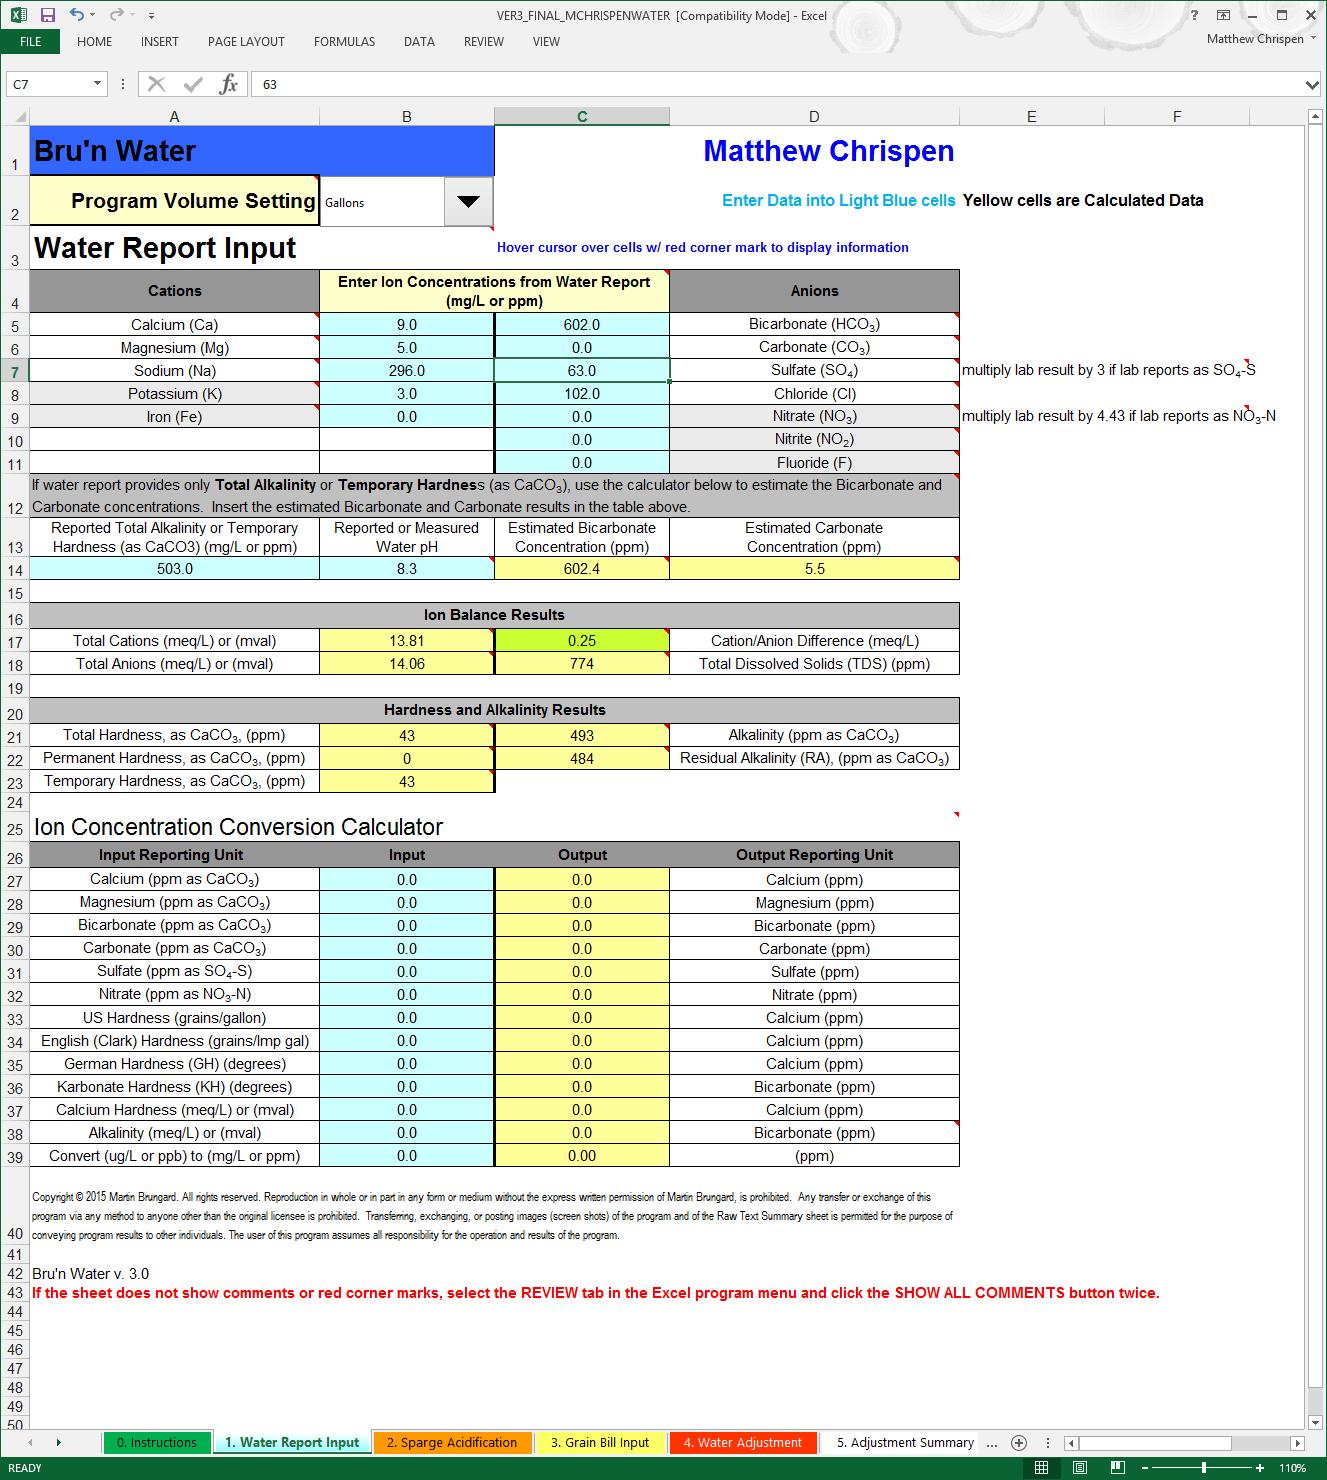 BWS 3.0 Water Report Input